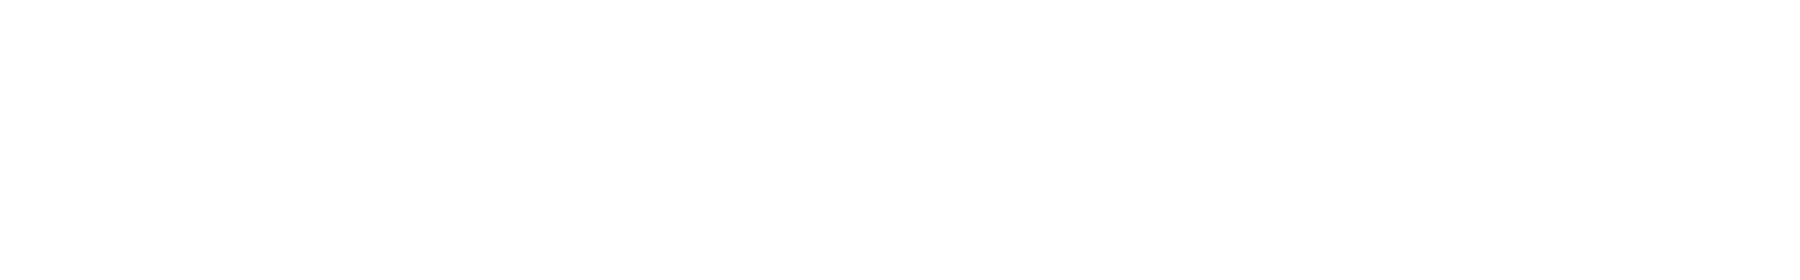 90 b piano radiosong 02